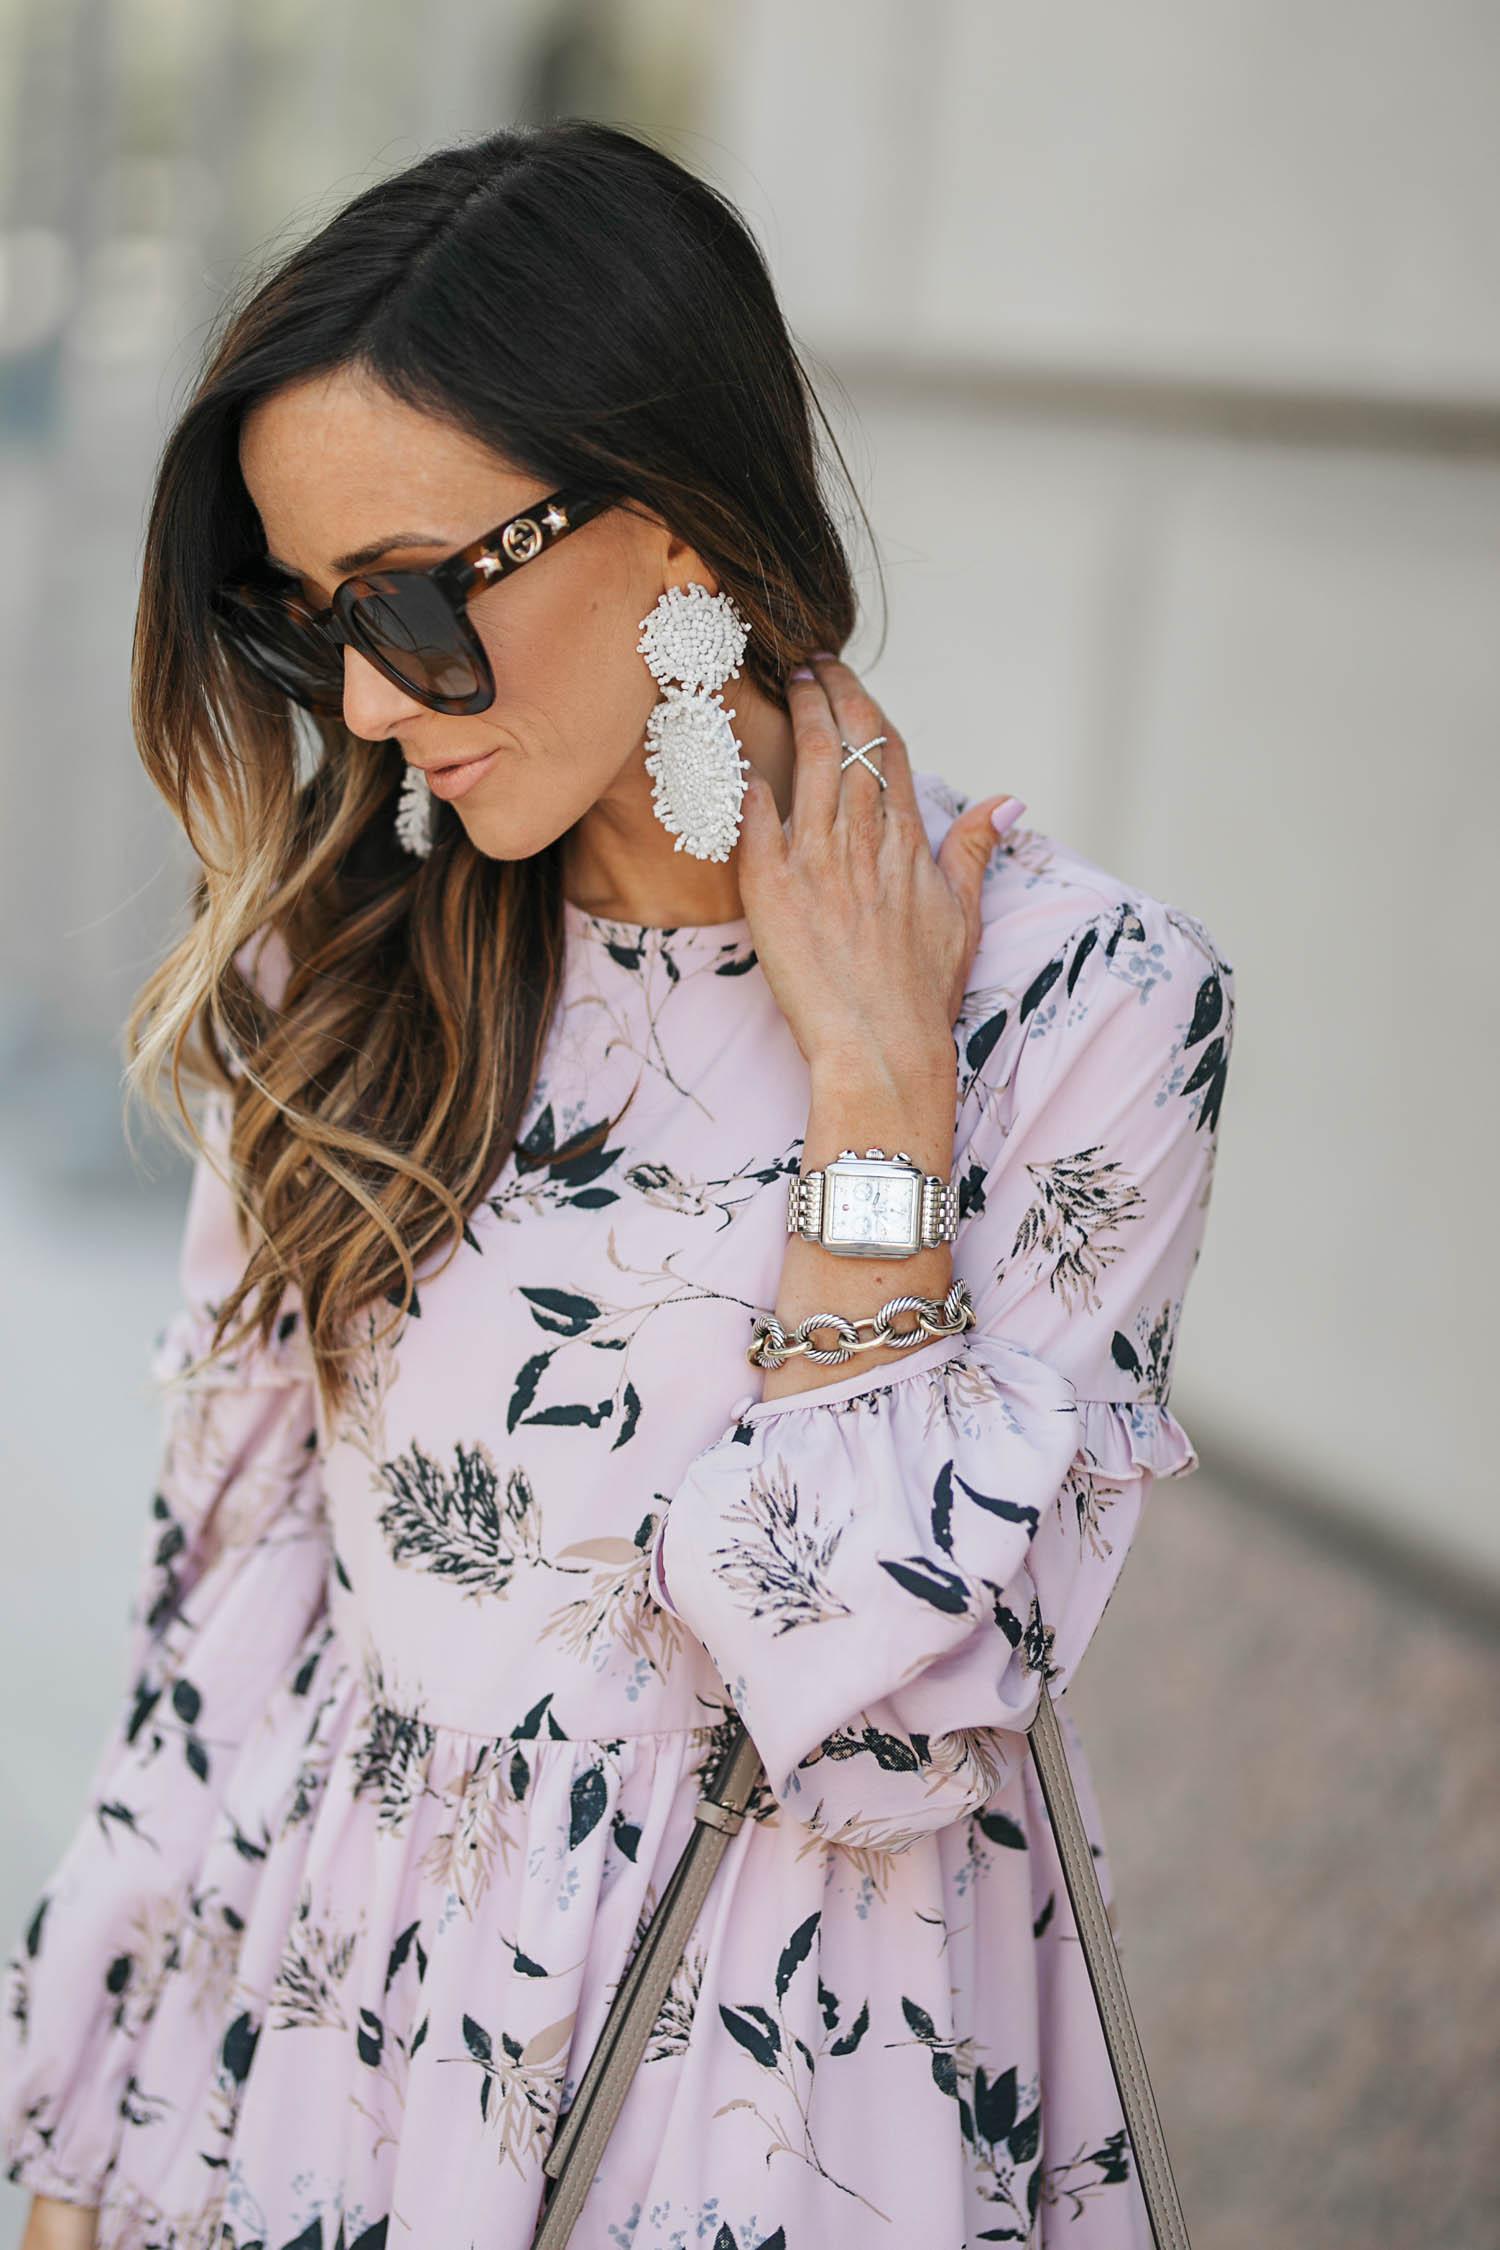 floral dress, urban outfitters, gray valentino sandals, valentino rockstud sandals, chloe faye medium satchel, baublebar earrings, statement earrings, gucci sunglasses